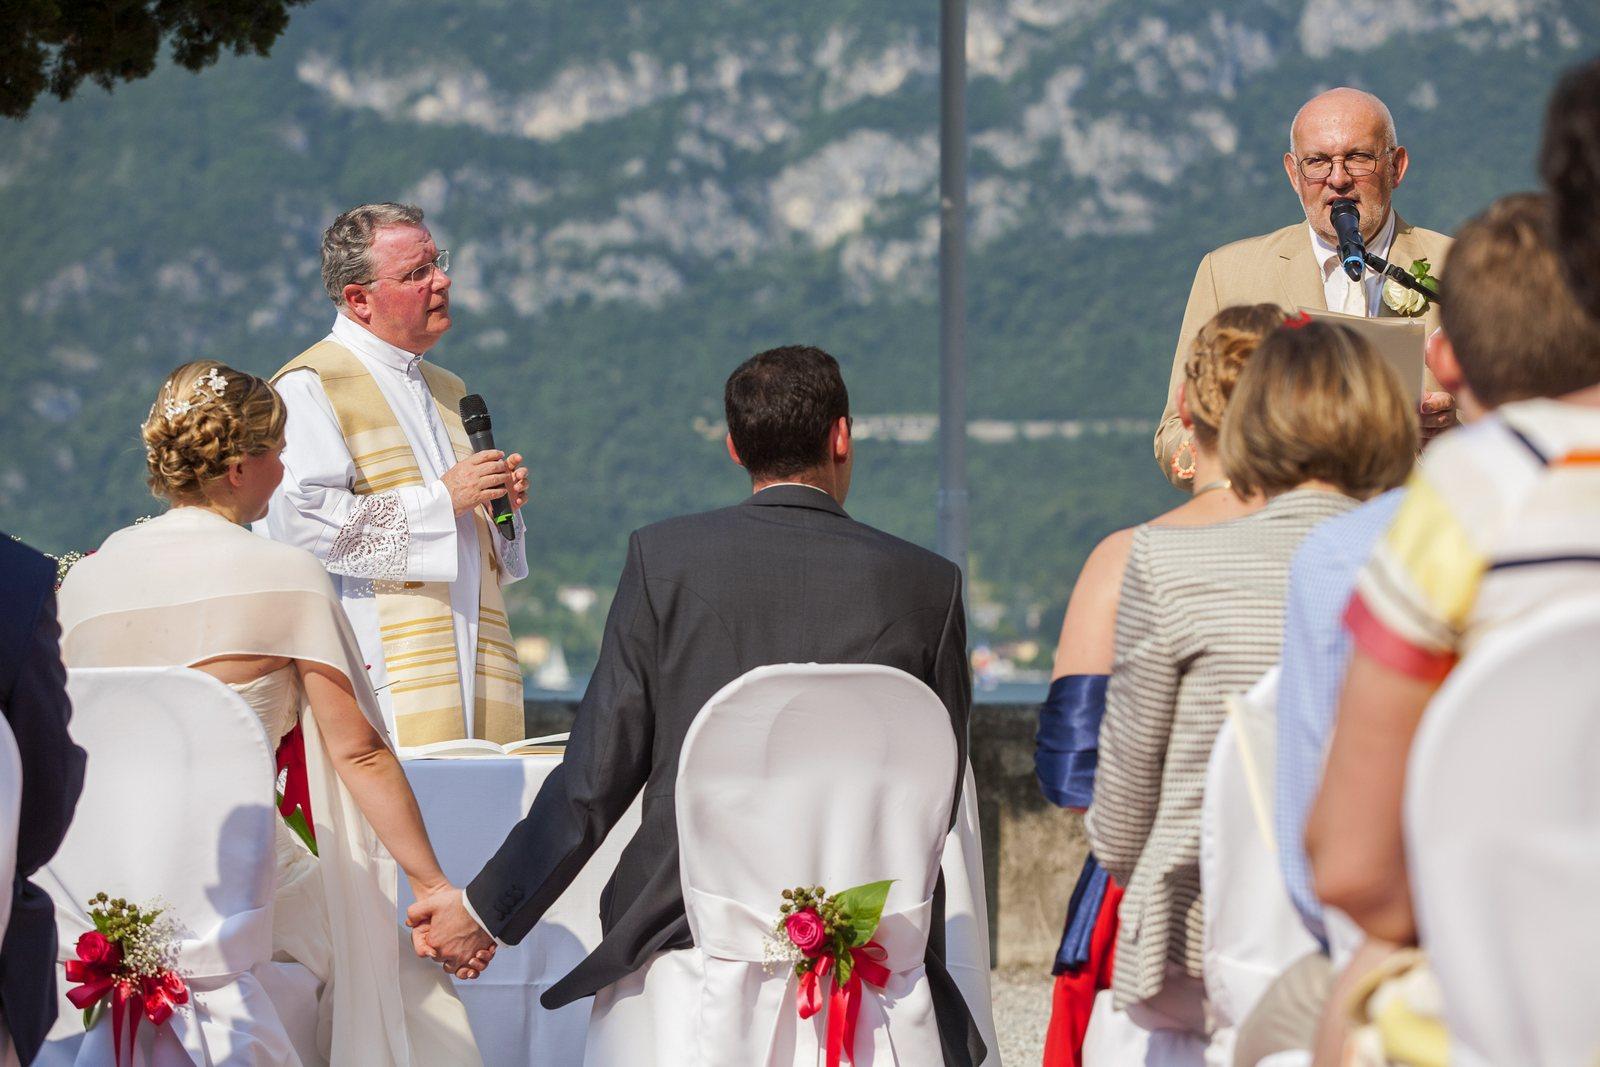 religious wedding ceremony in villa corte del lago